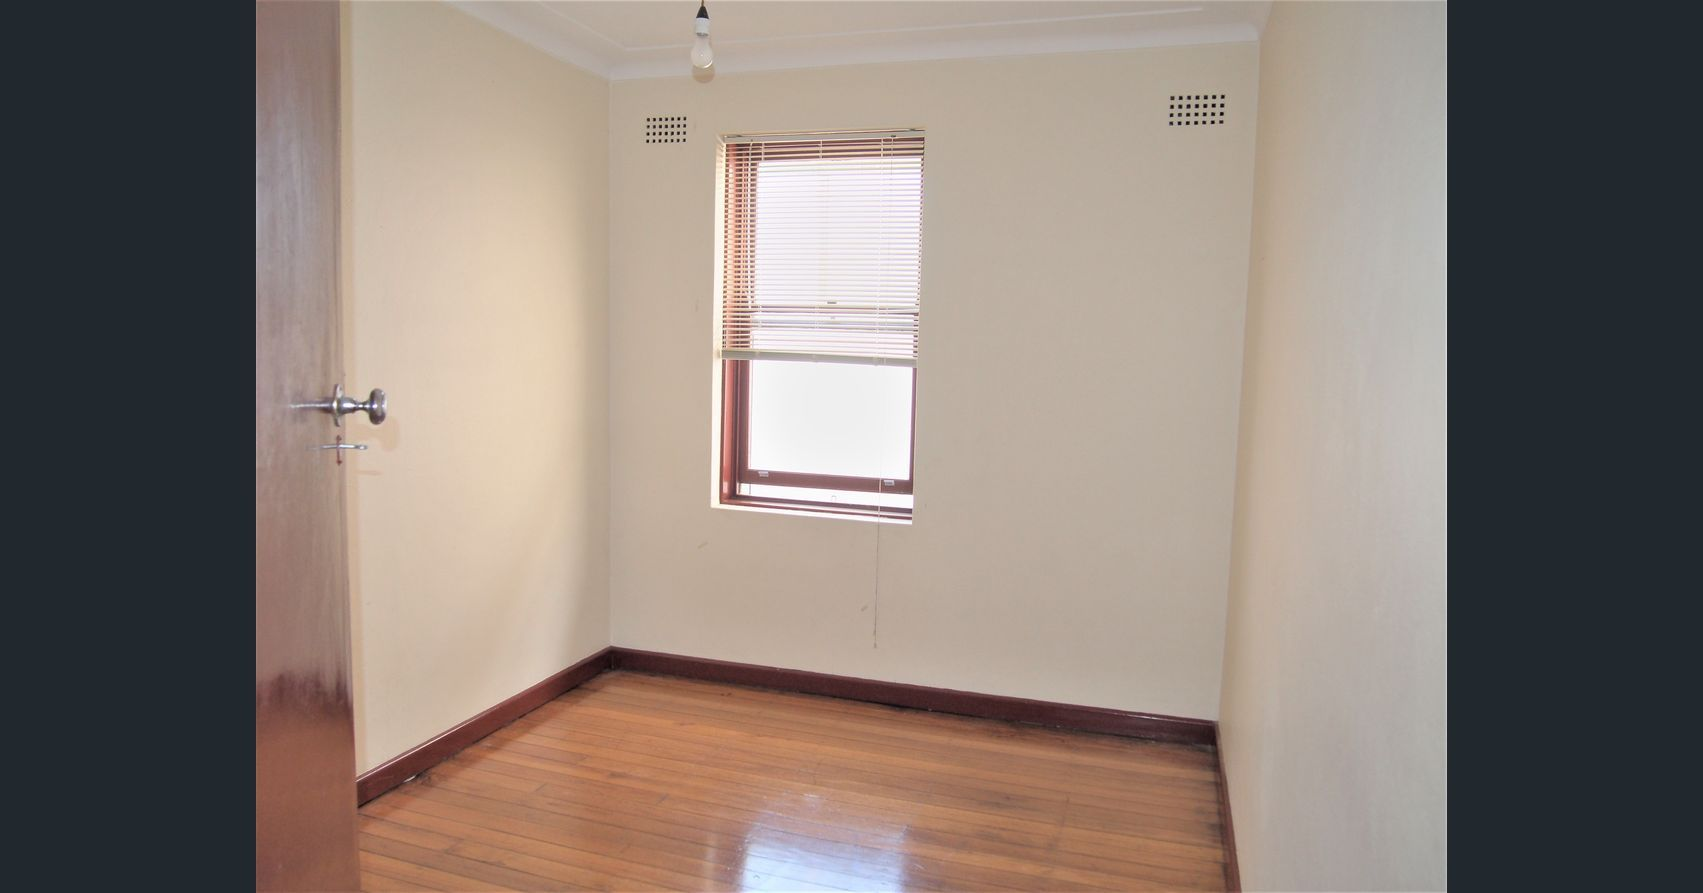 314 Great North Road, Wareemba NSW 2046, Image 2